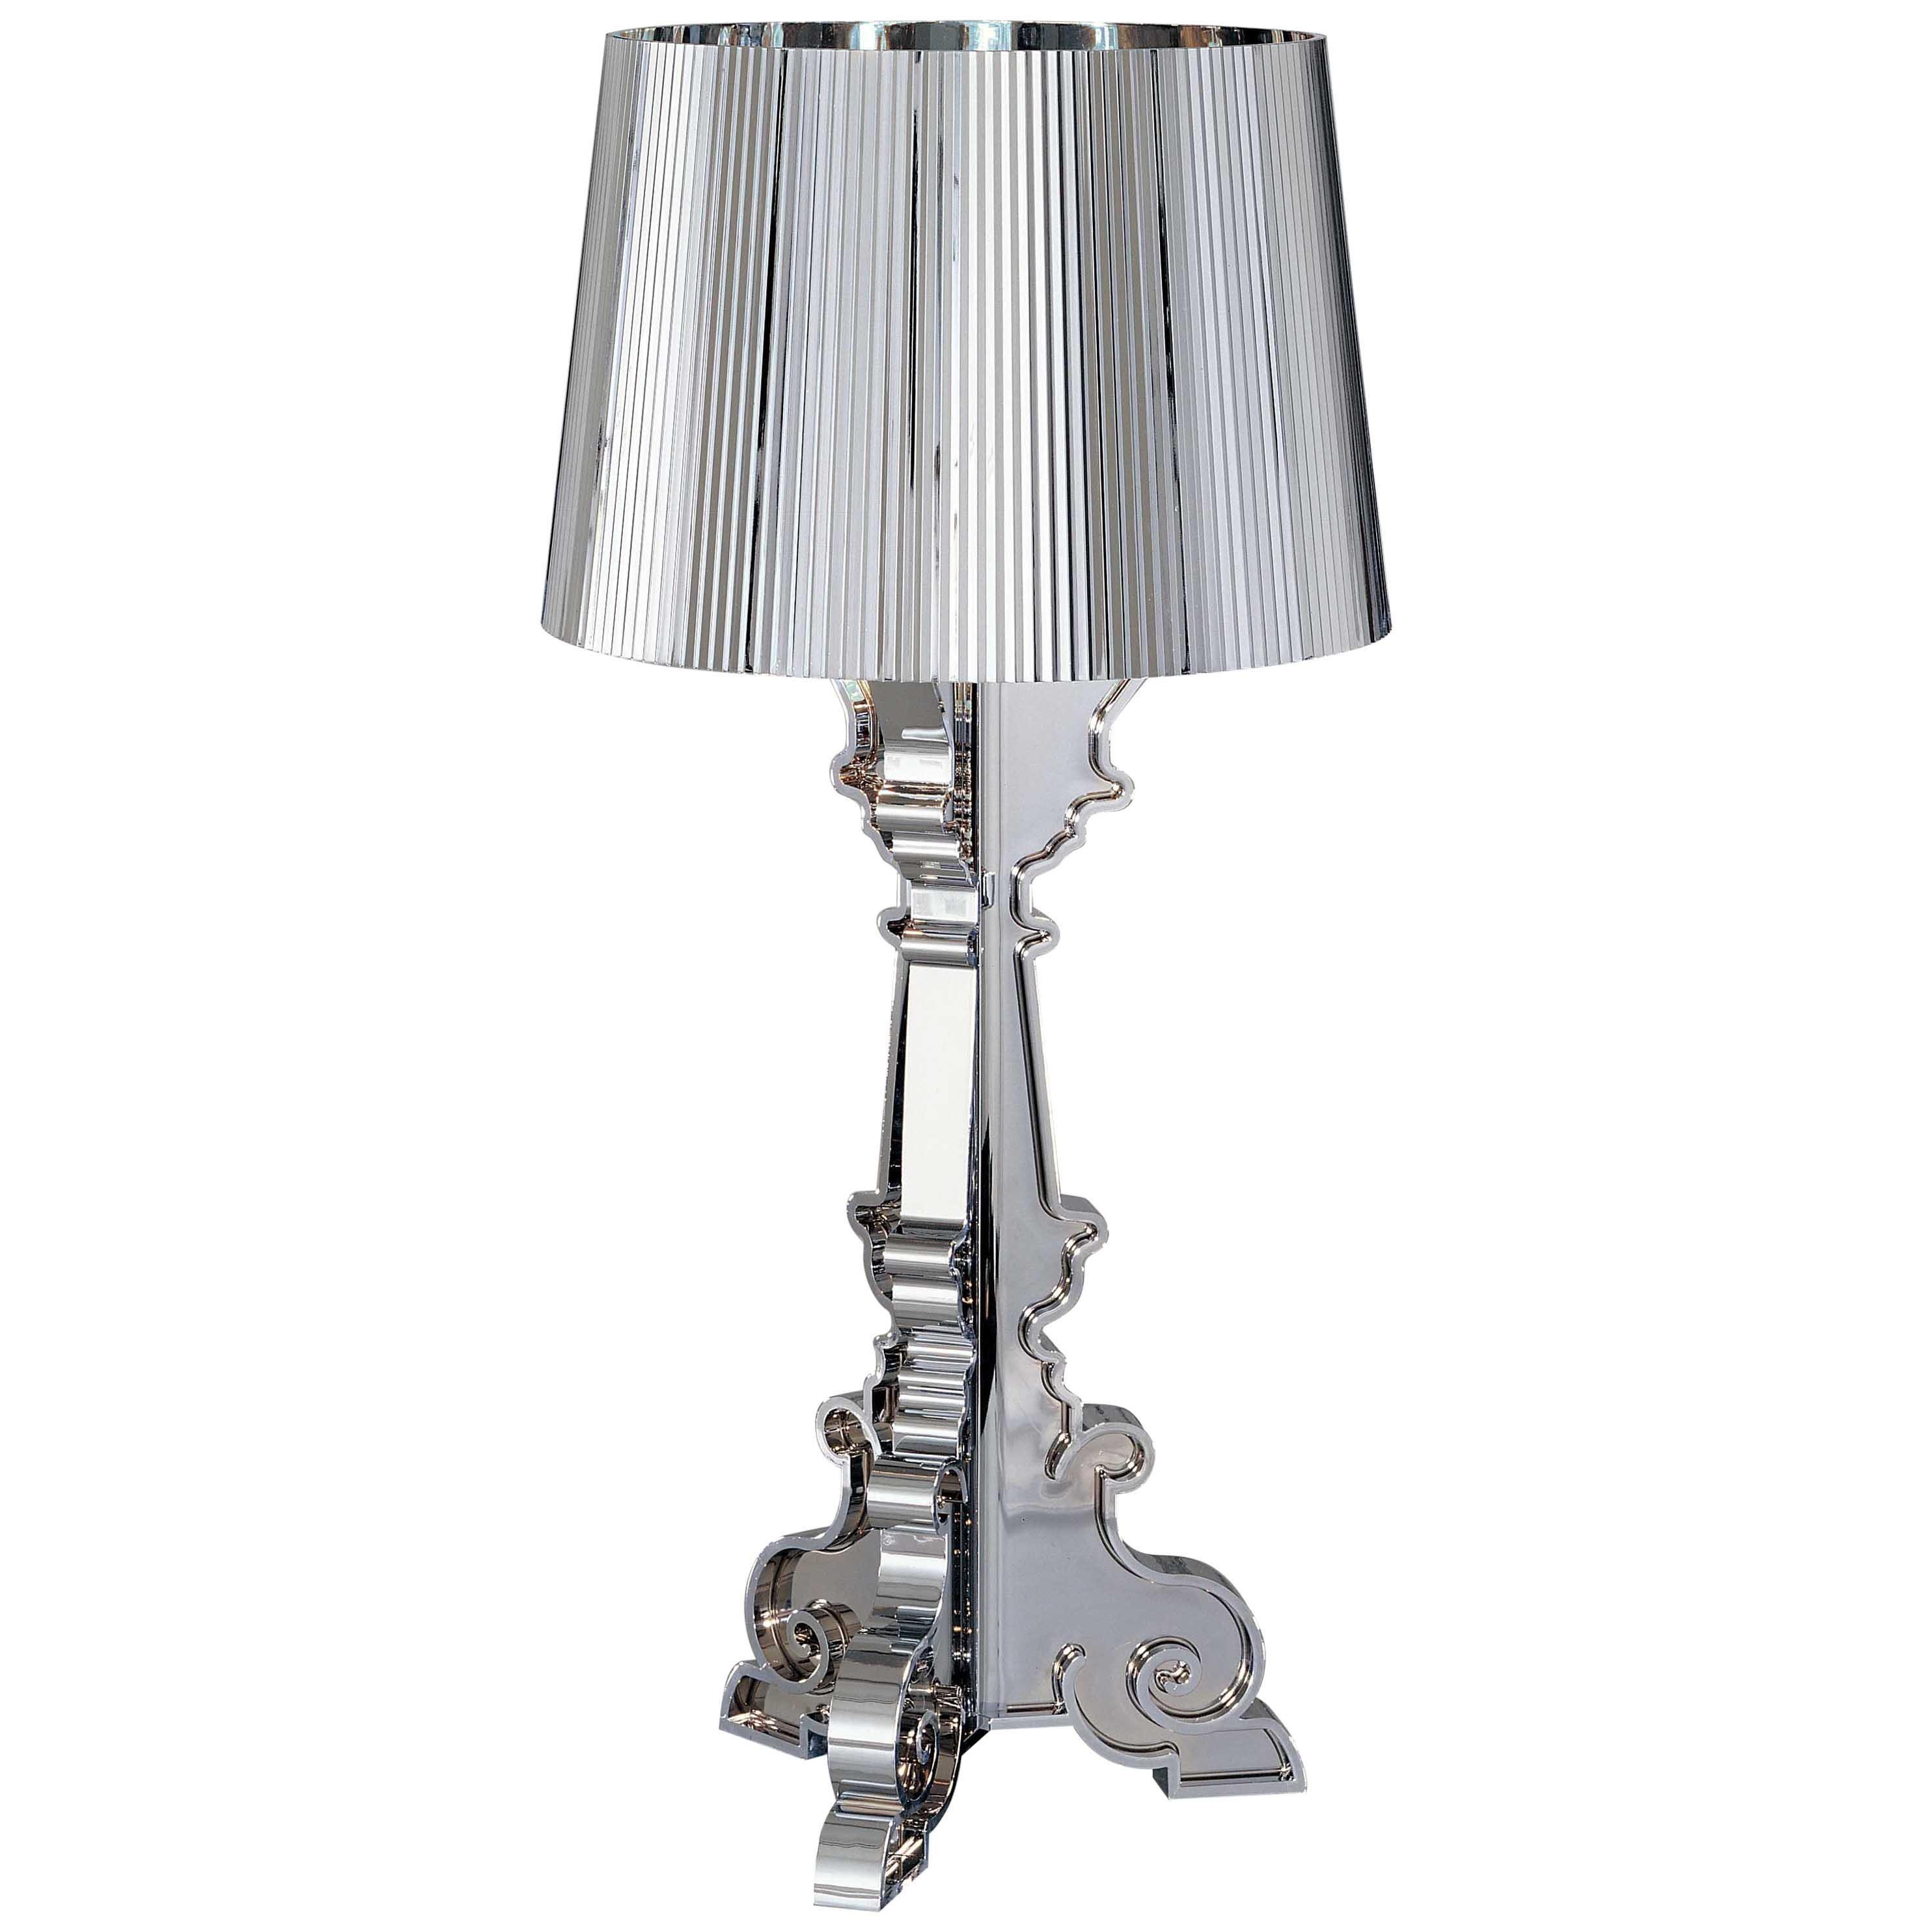 Kartell Bourgie Lamp in Silver by Ferruccio Laviani